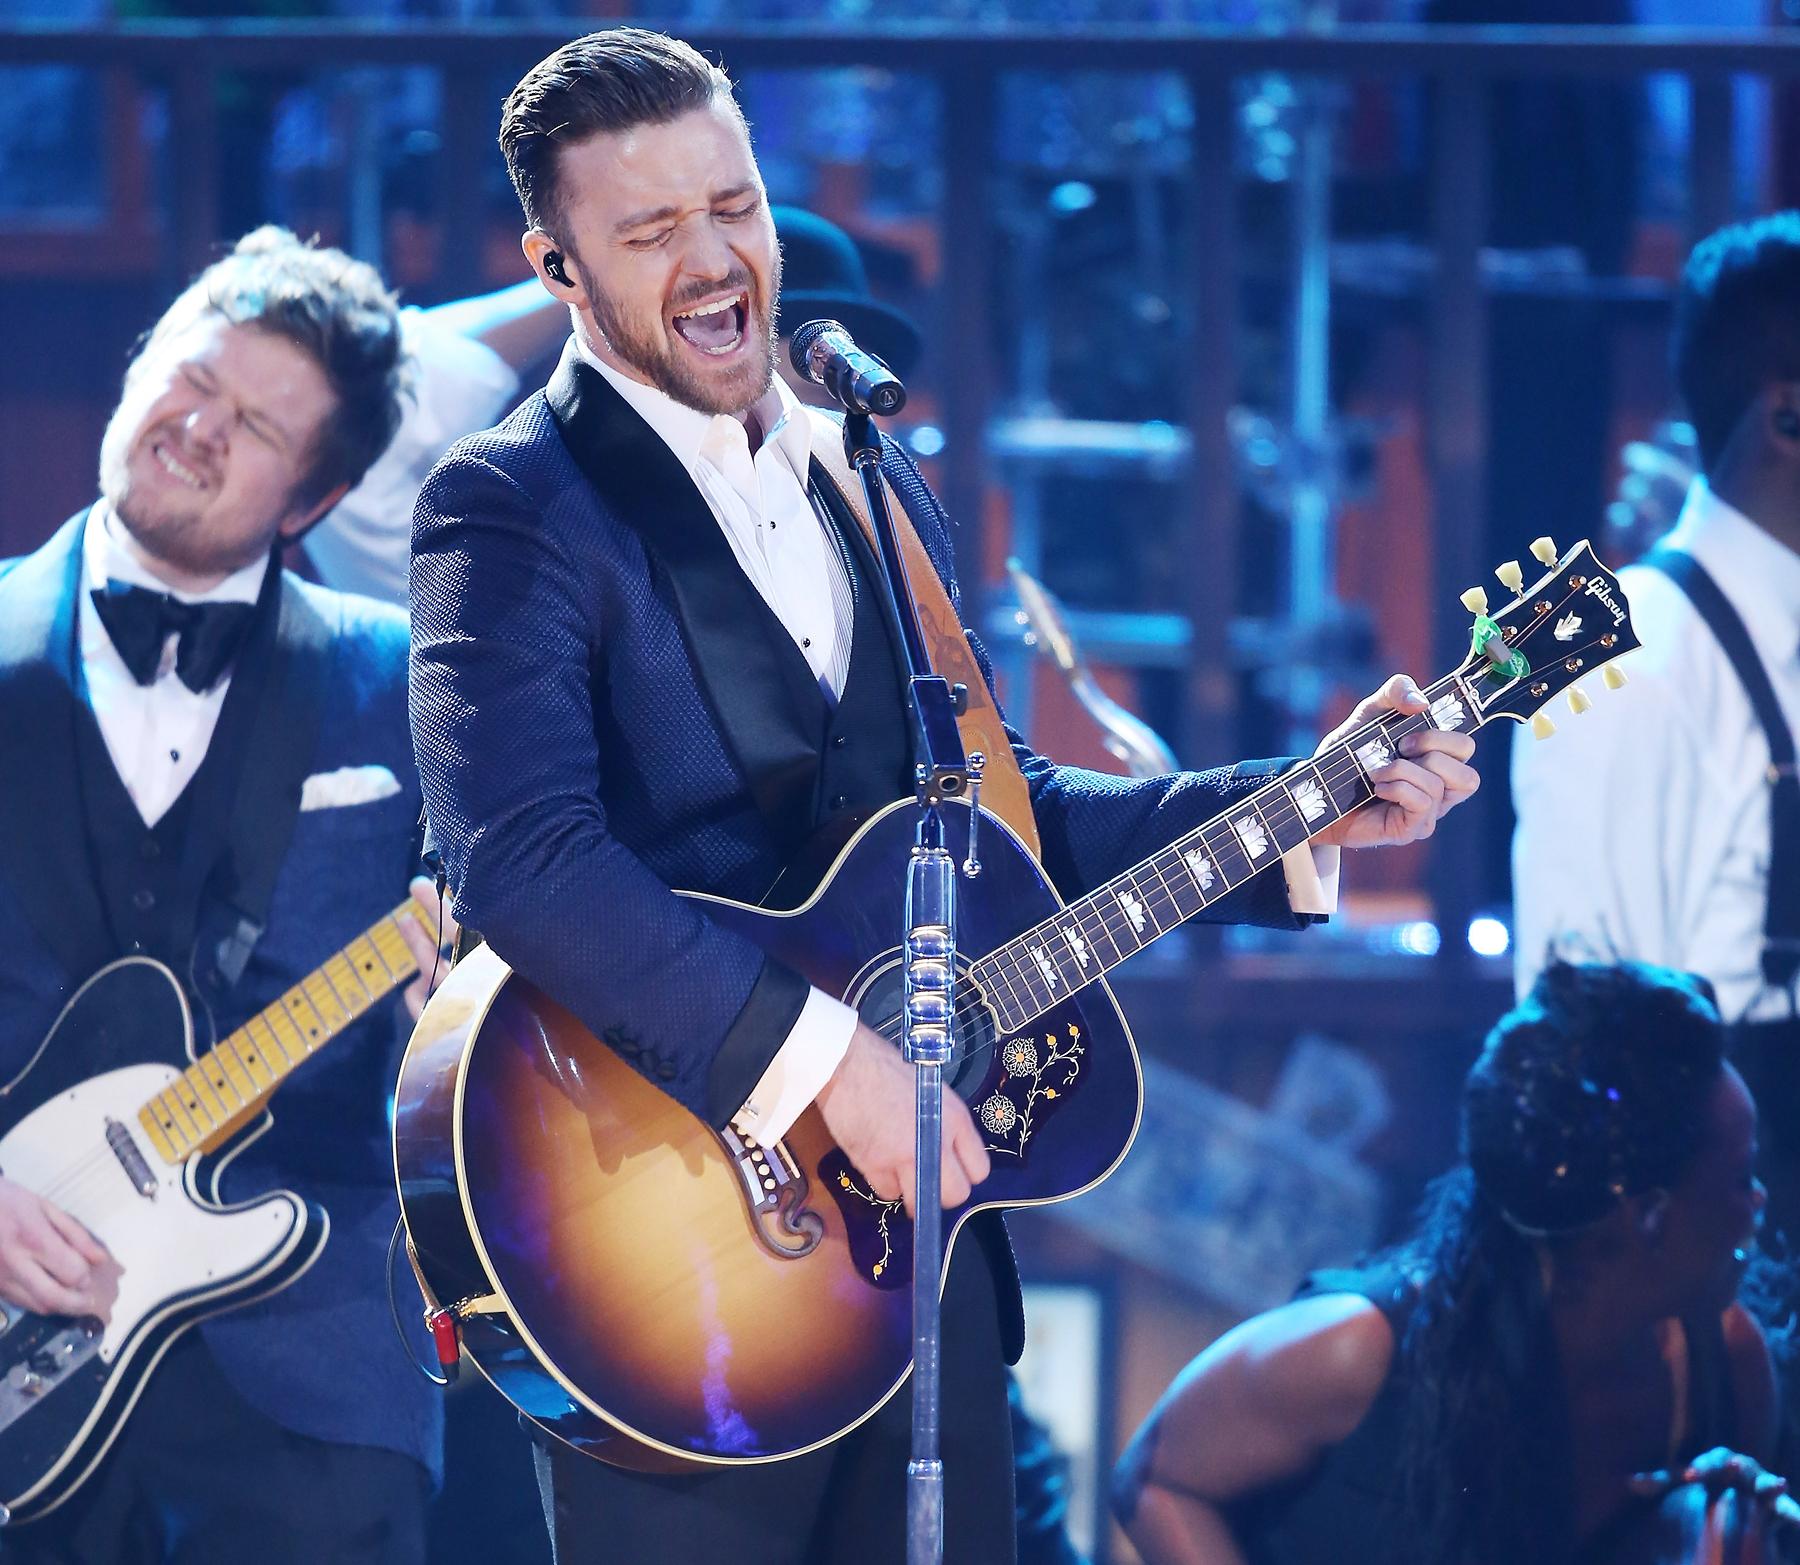 Justin Timberlake, Beyonce Have Top Selling iTunes Albums